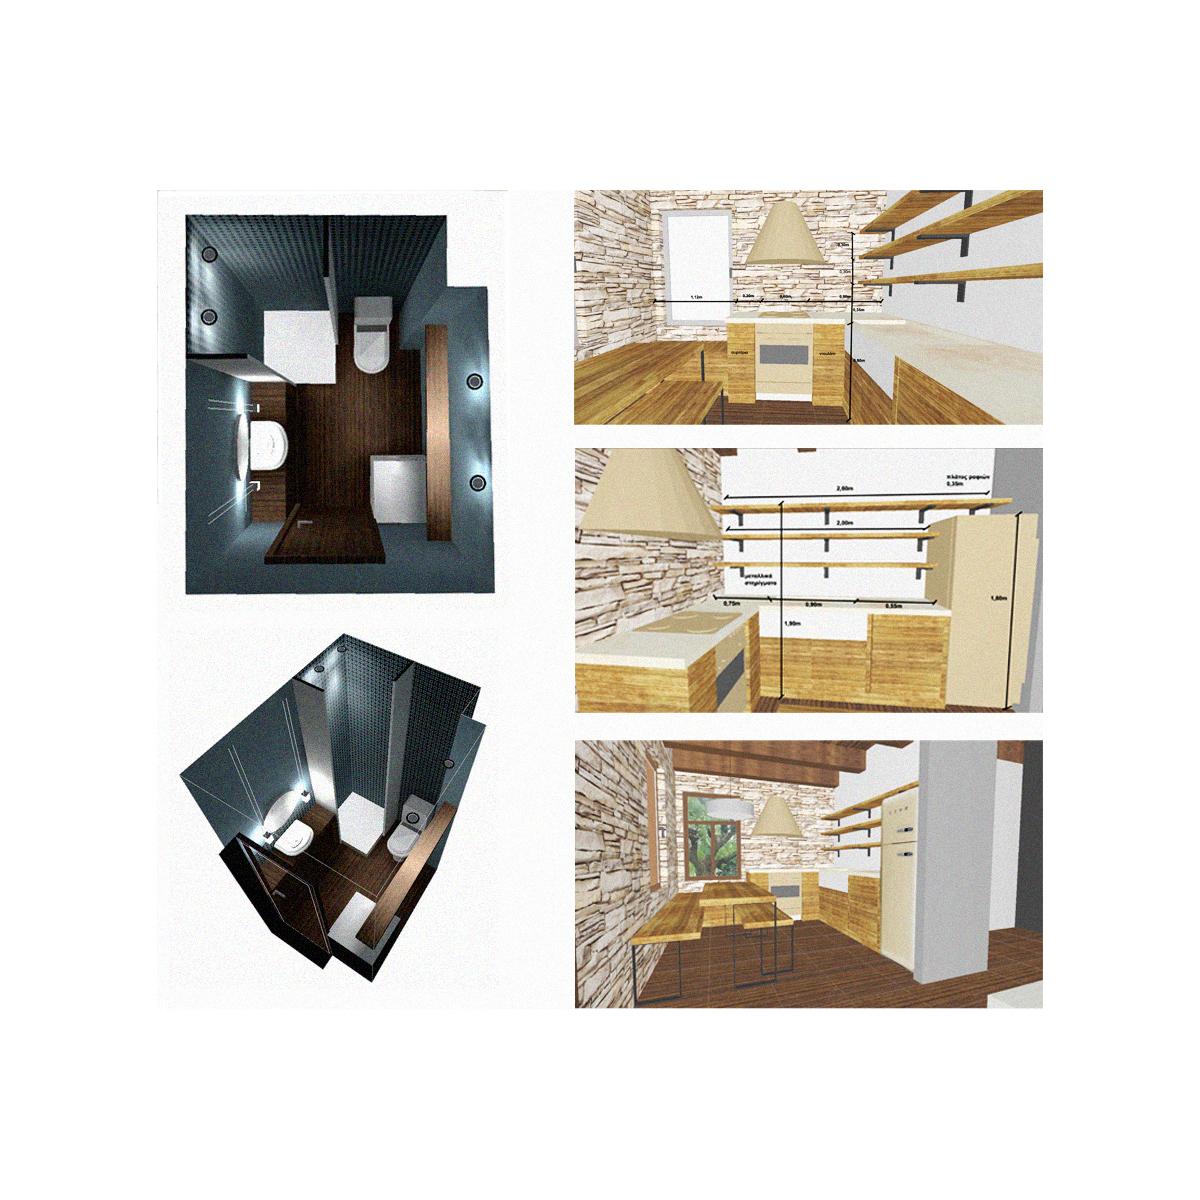 Spatial design 2